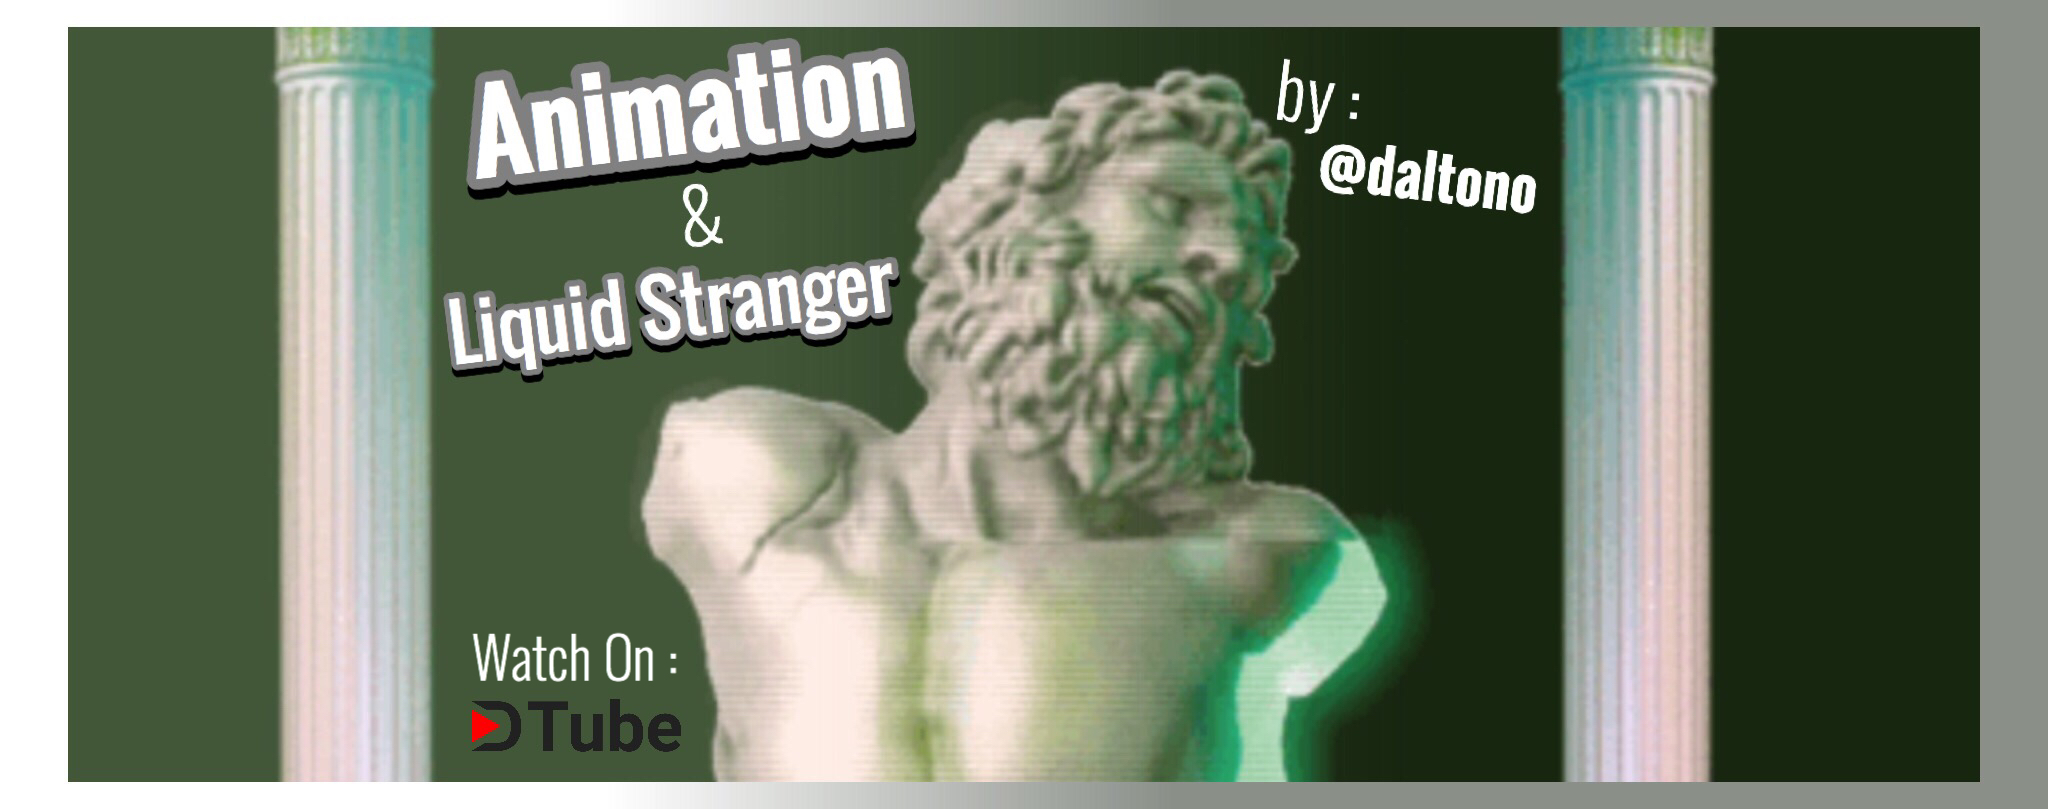 green-statue-thumbnail.JPG